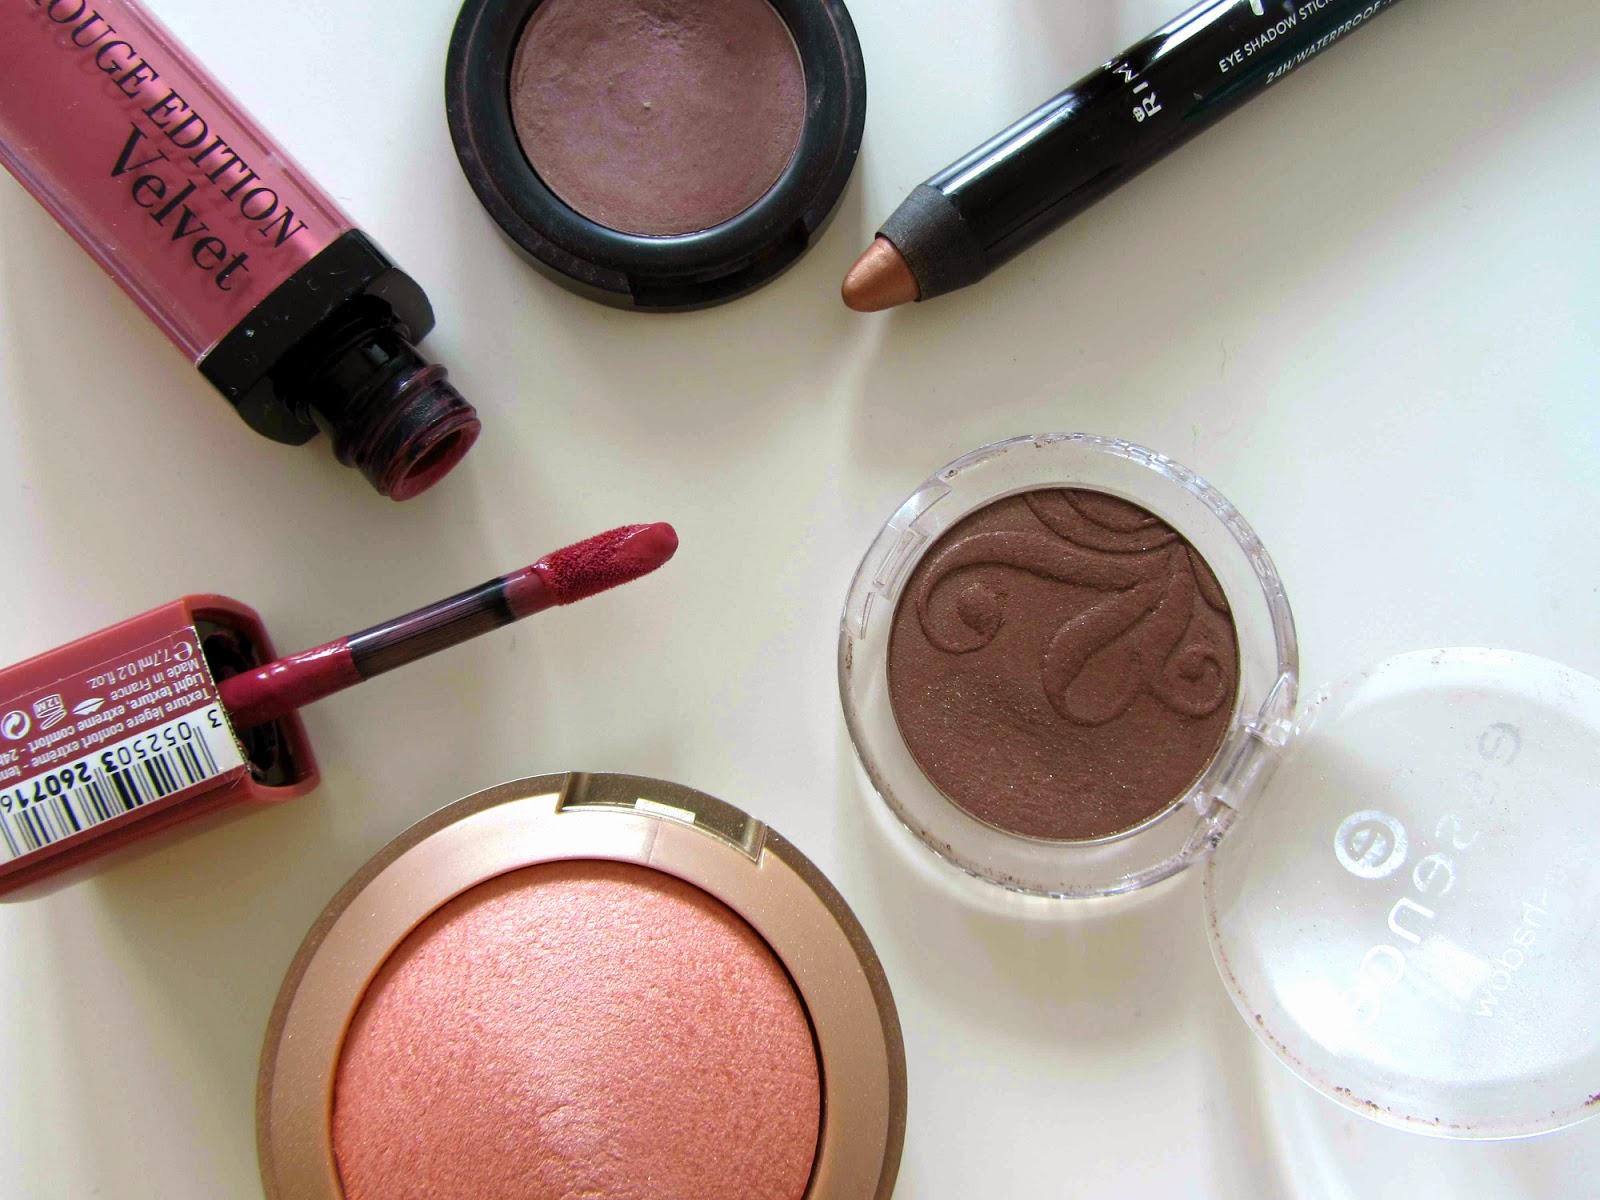 makeup milani luminoso essence manhattan golden rose 212 rimmel kate 100 rose gold bourjois rouge edition velvet nude-ist